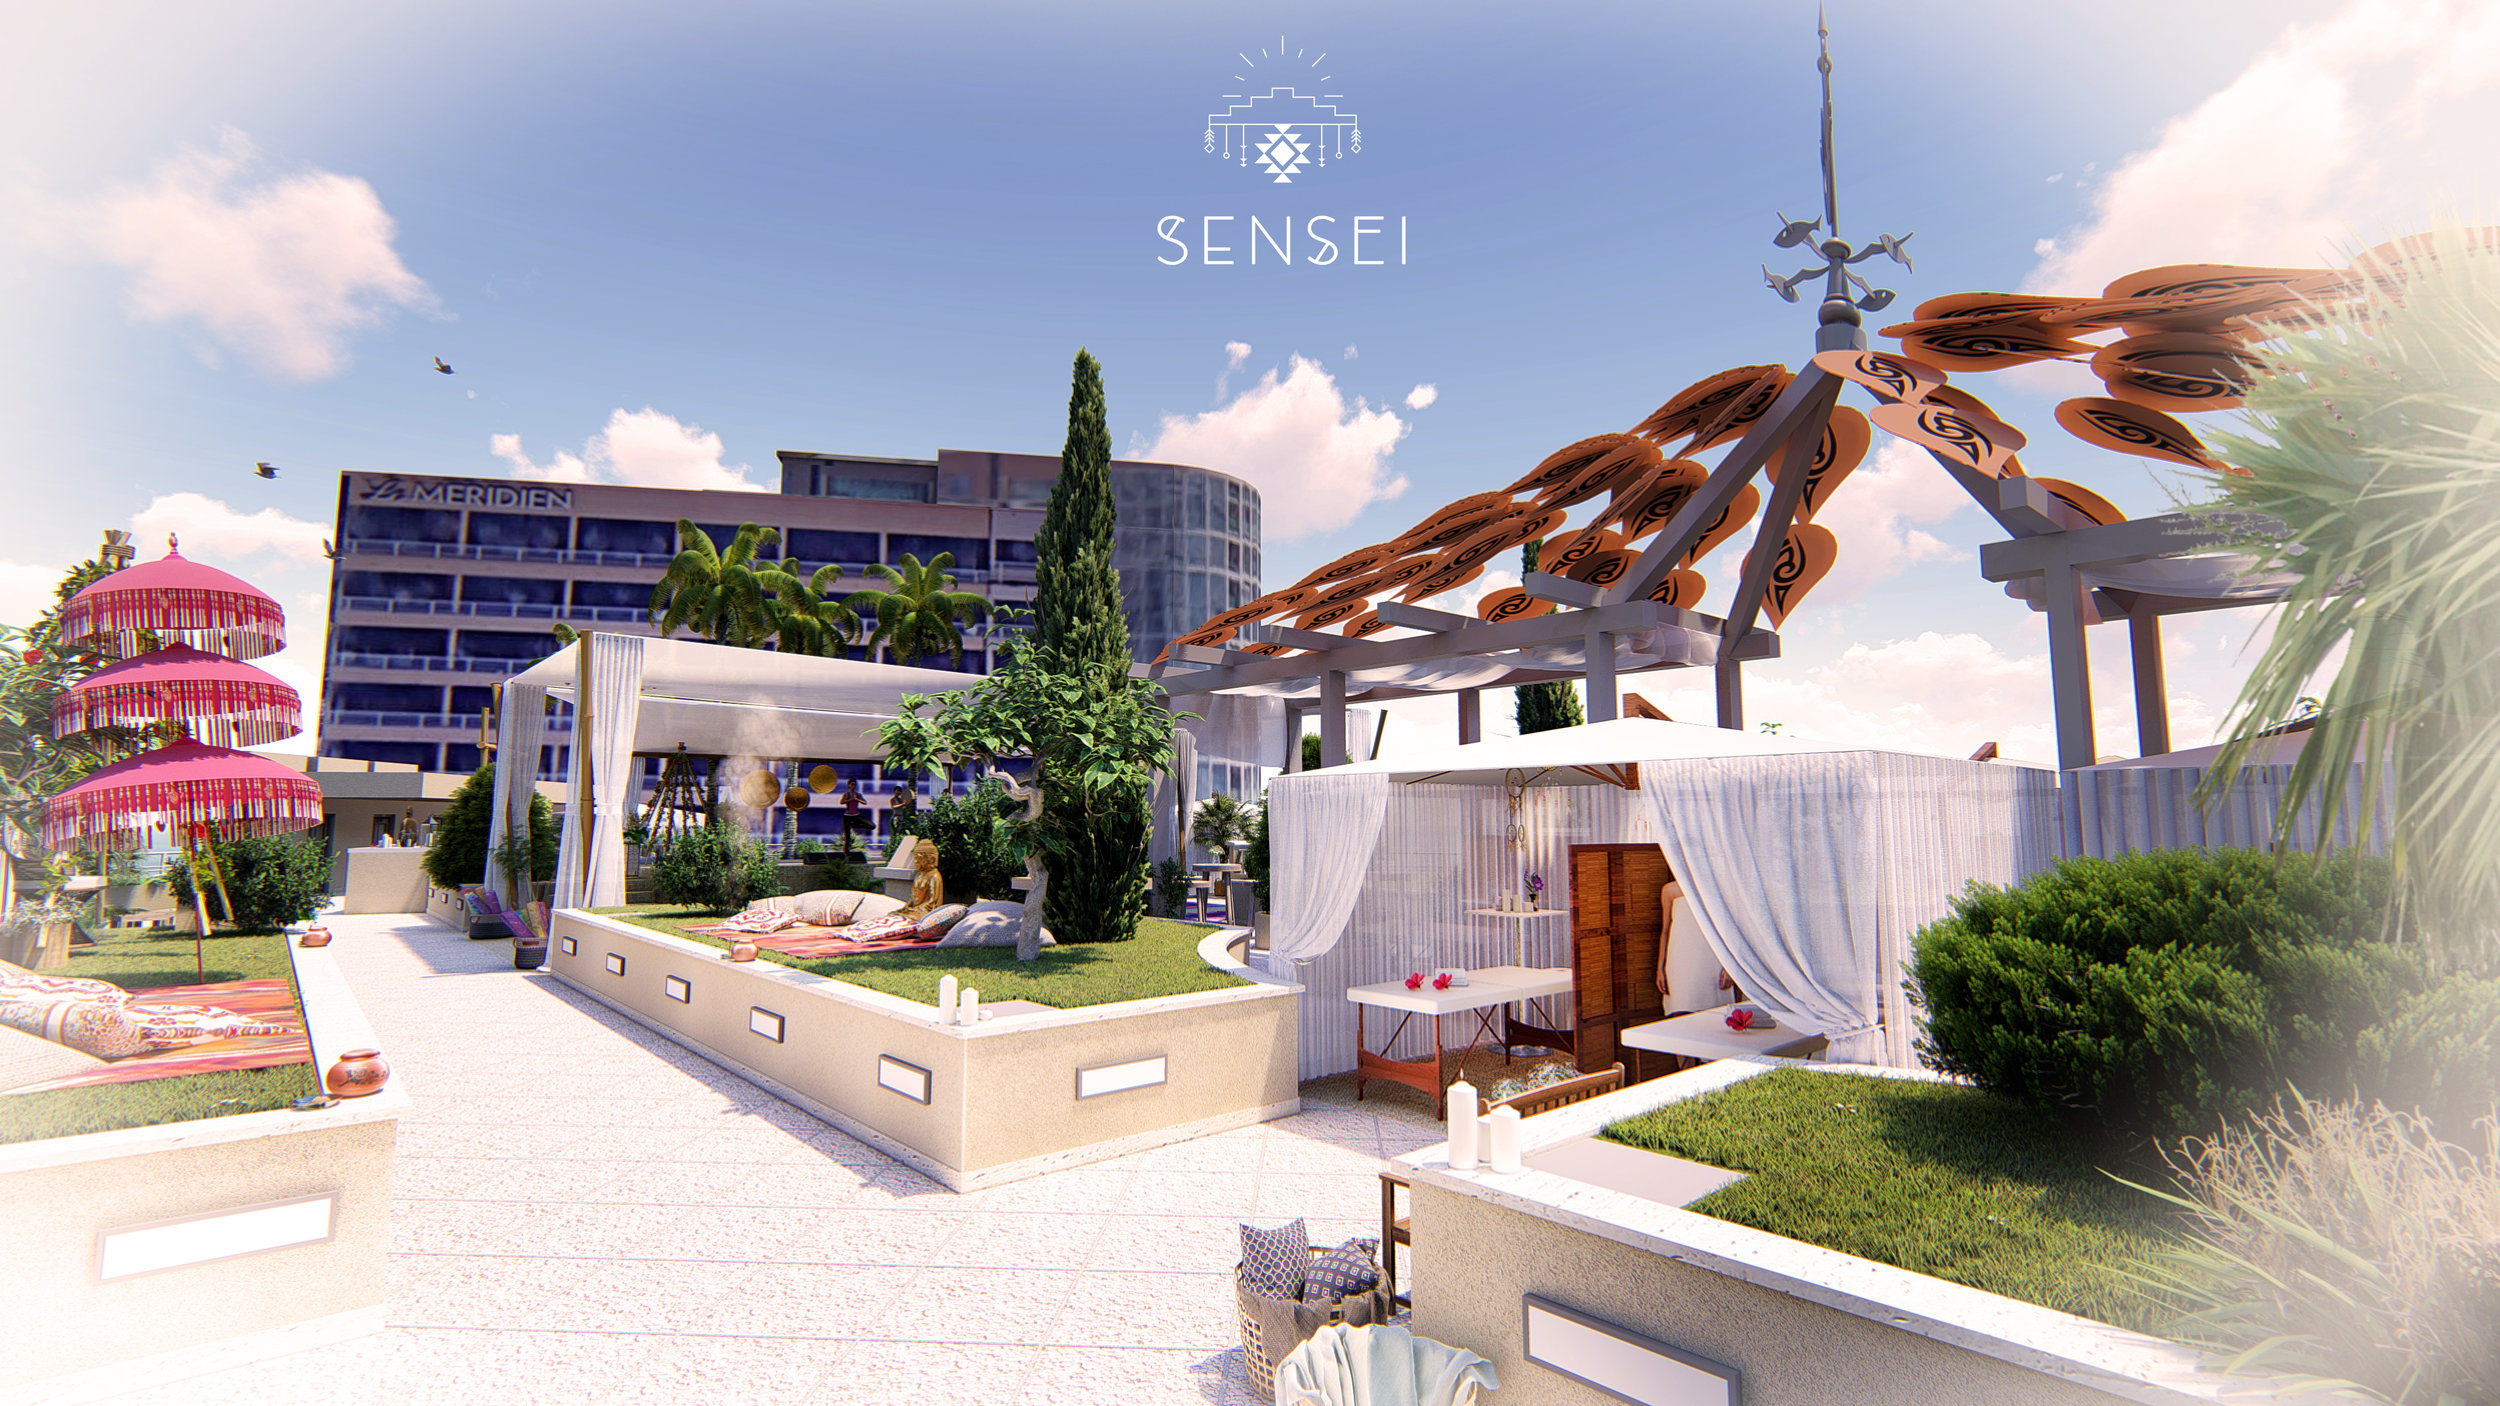 Sensei -Terrasse -vue 3d -01.jpg